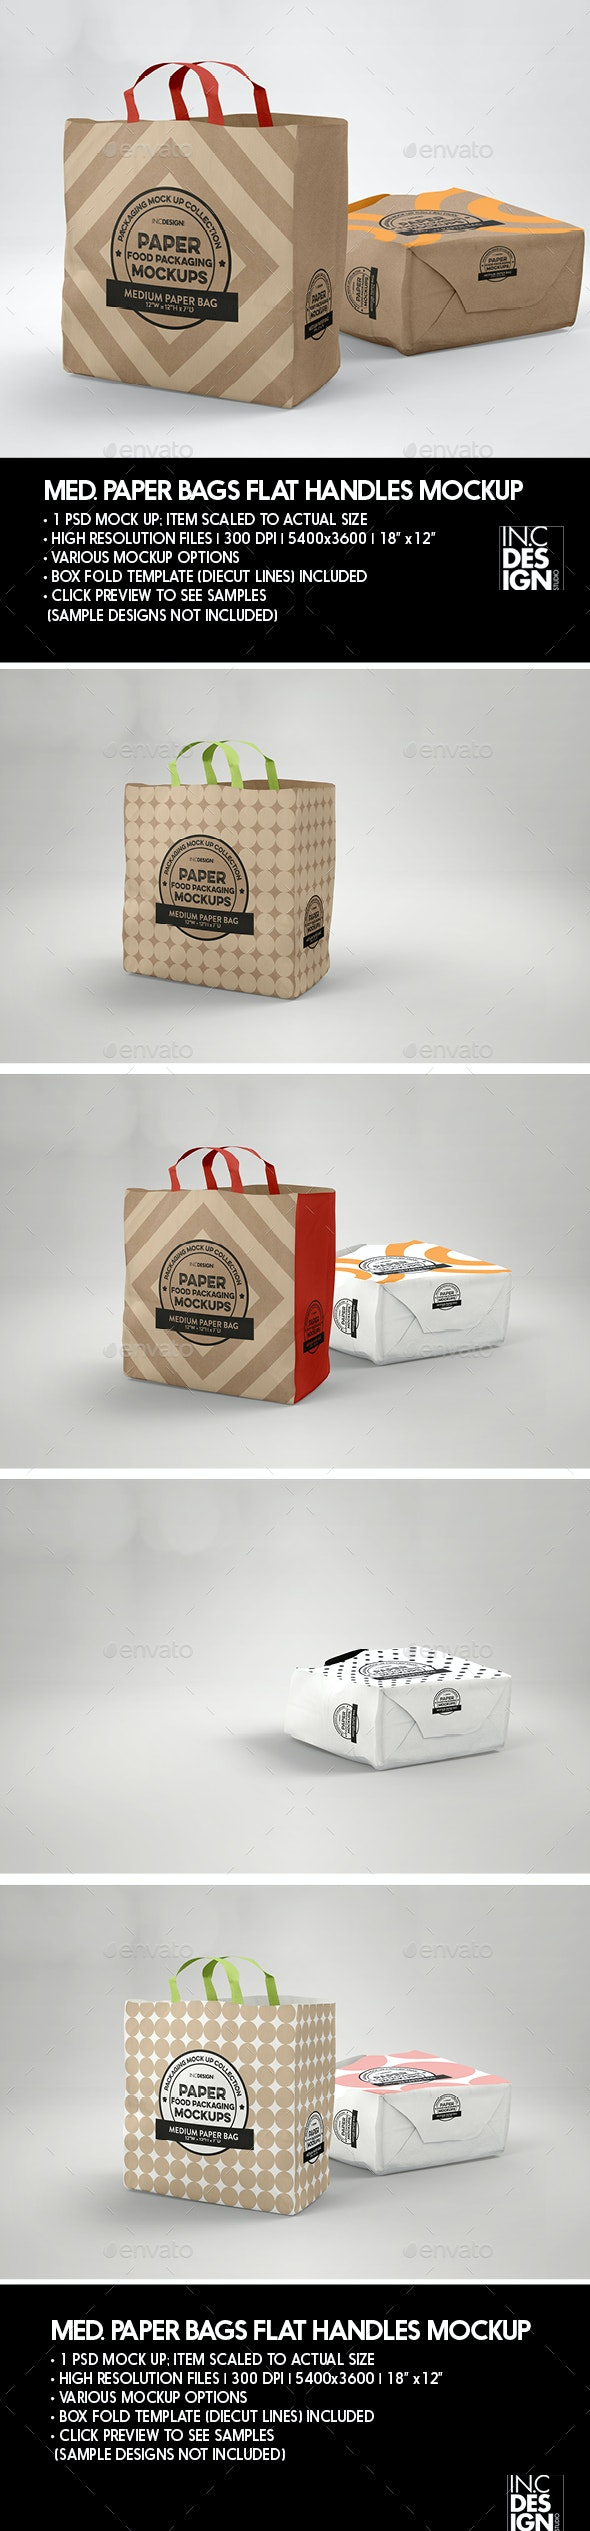 MEDIUM Paper Bag with Flat Handles Packaging Mockup - Product Mock-Ups Graphics